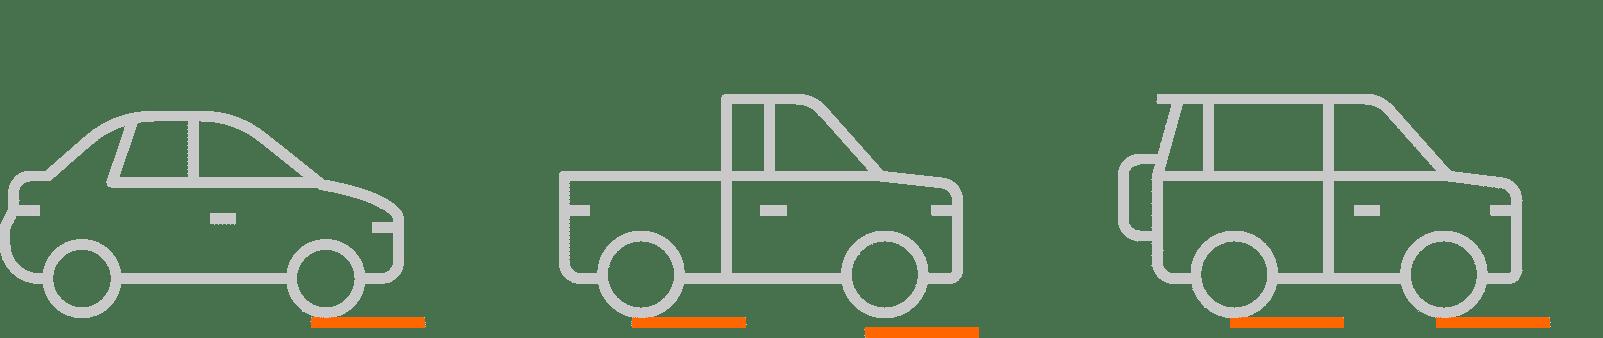 car truck suv